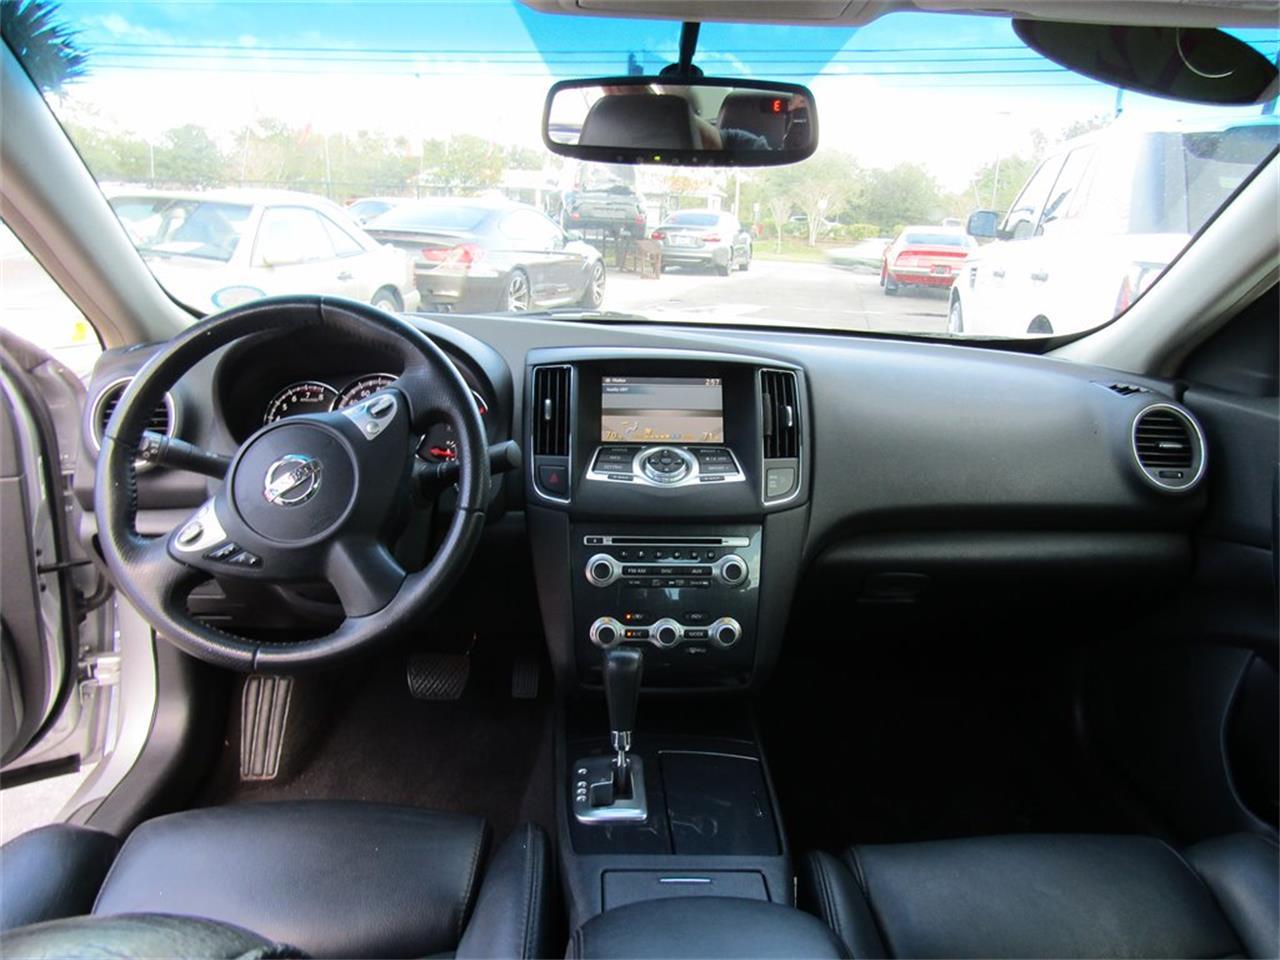 2012 Nissan Maxima (CC-1309412) for sale in Orlando, Florida